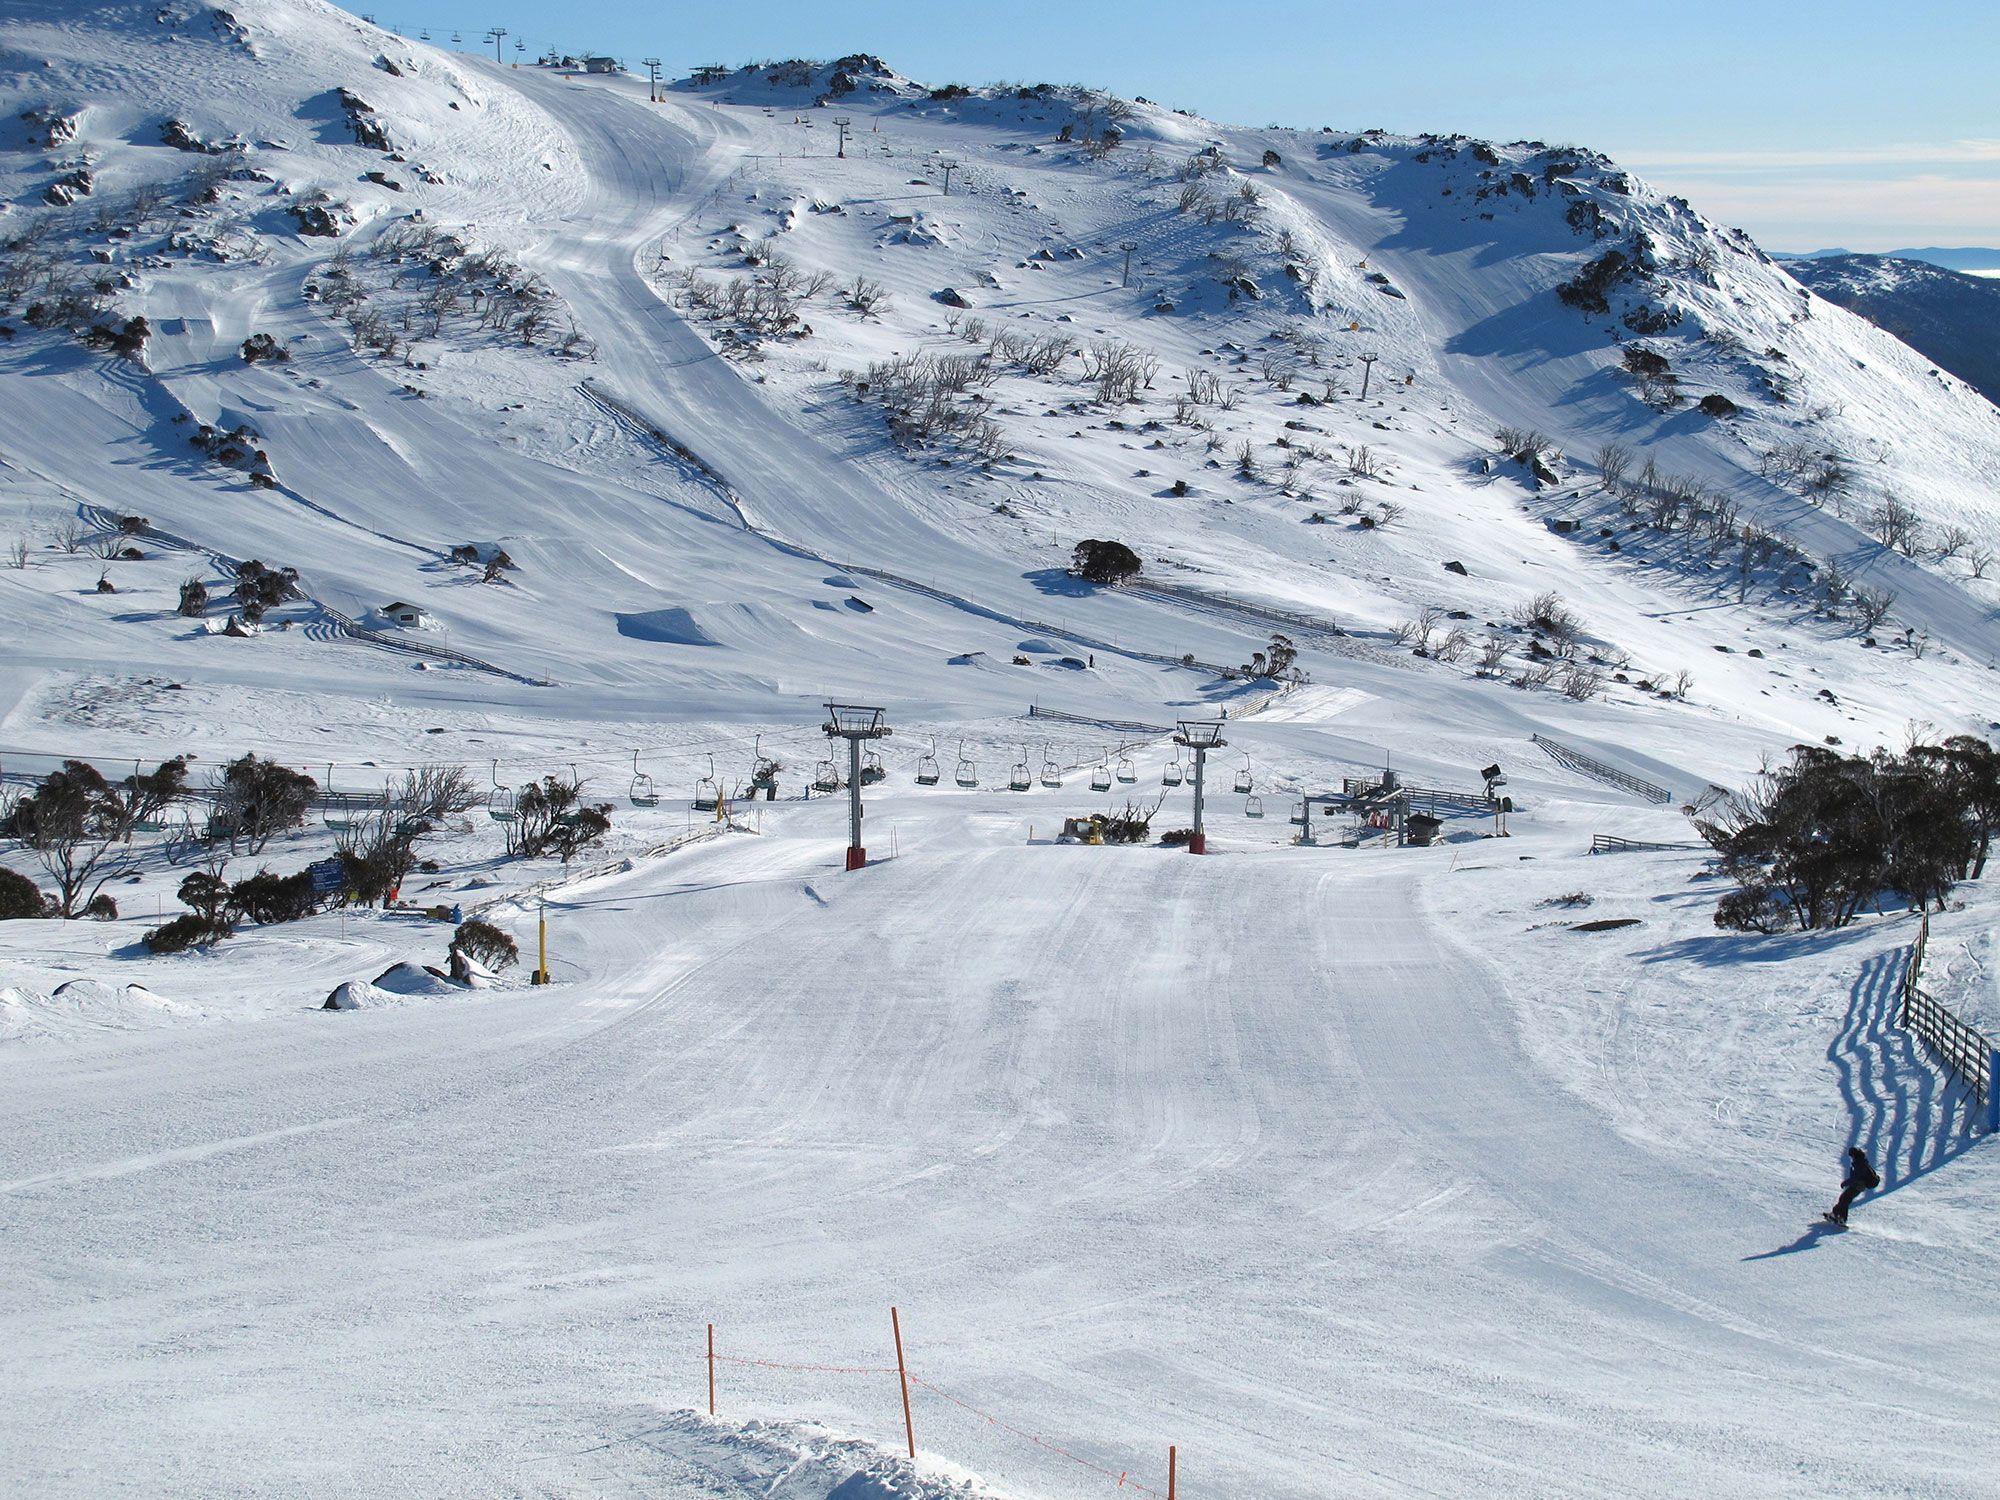 British ski instructor jailed for 'vicious rape' during ski season